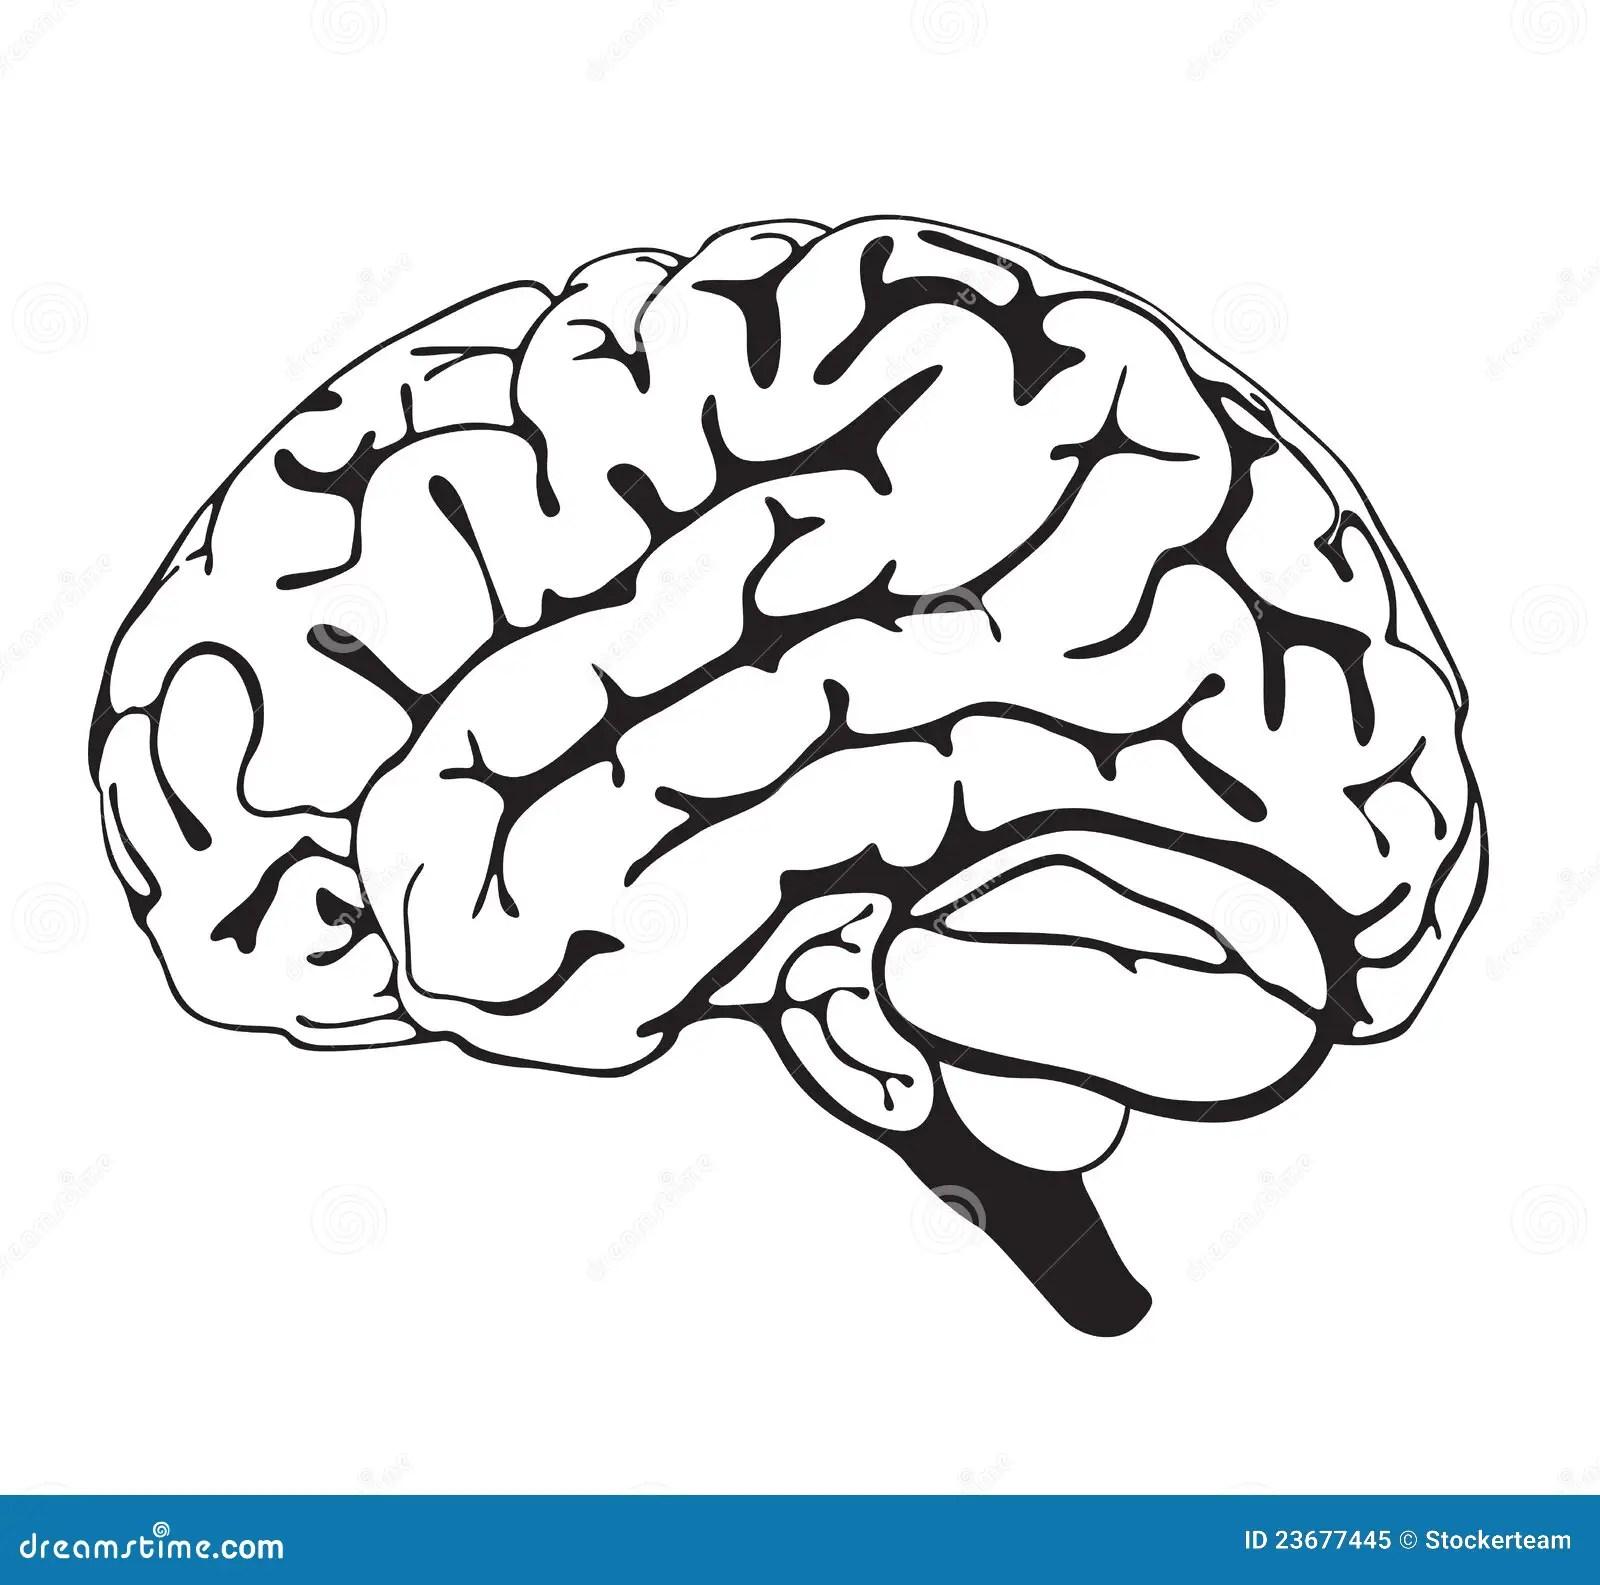 Drawing Brain Closeup Royalty Free Stock Photo